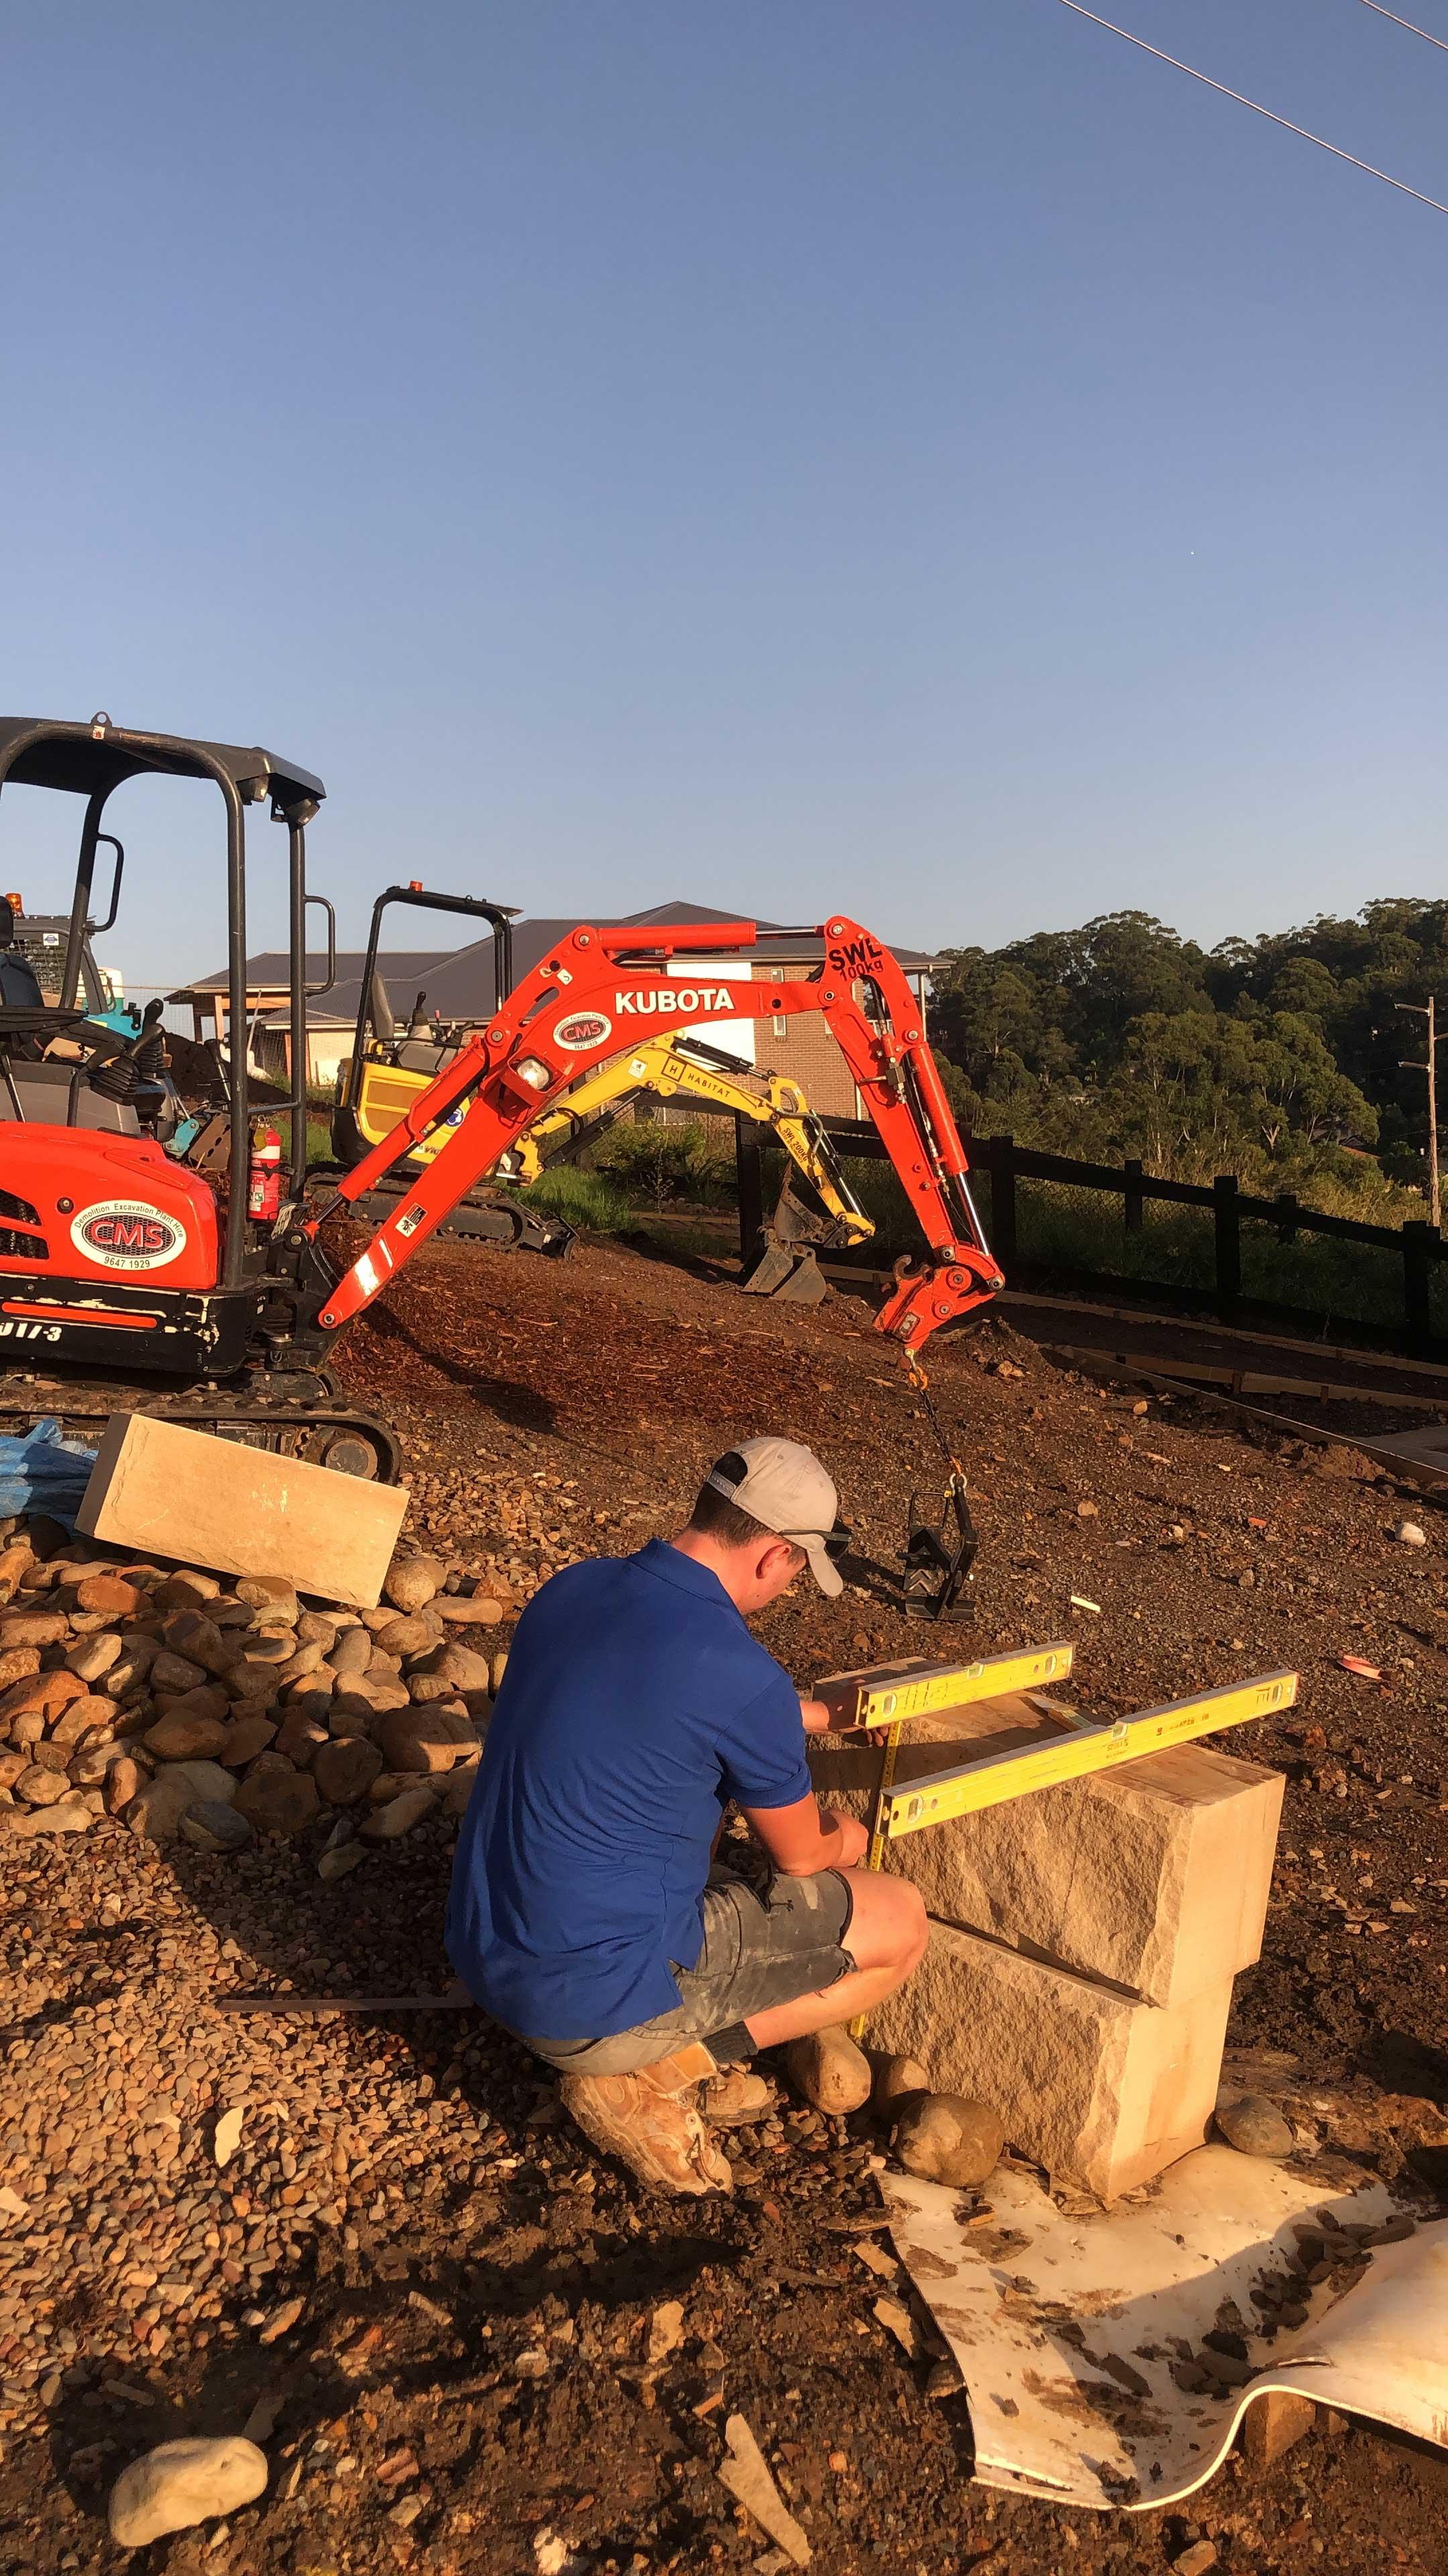 Shaping sandstone blocks